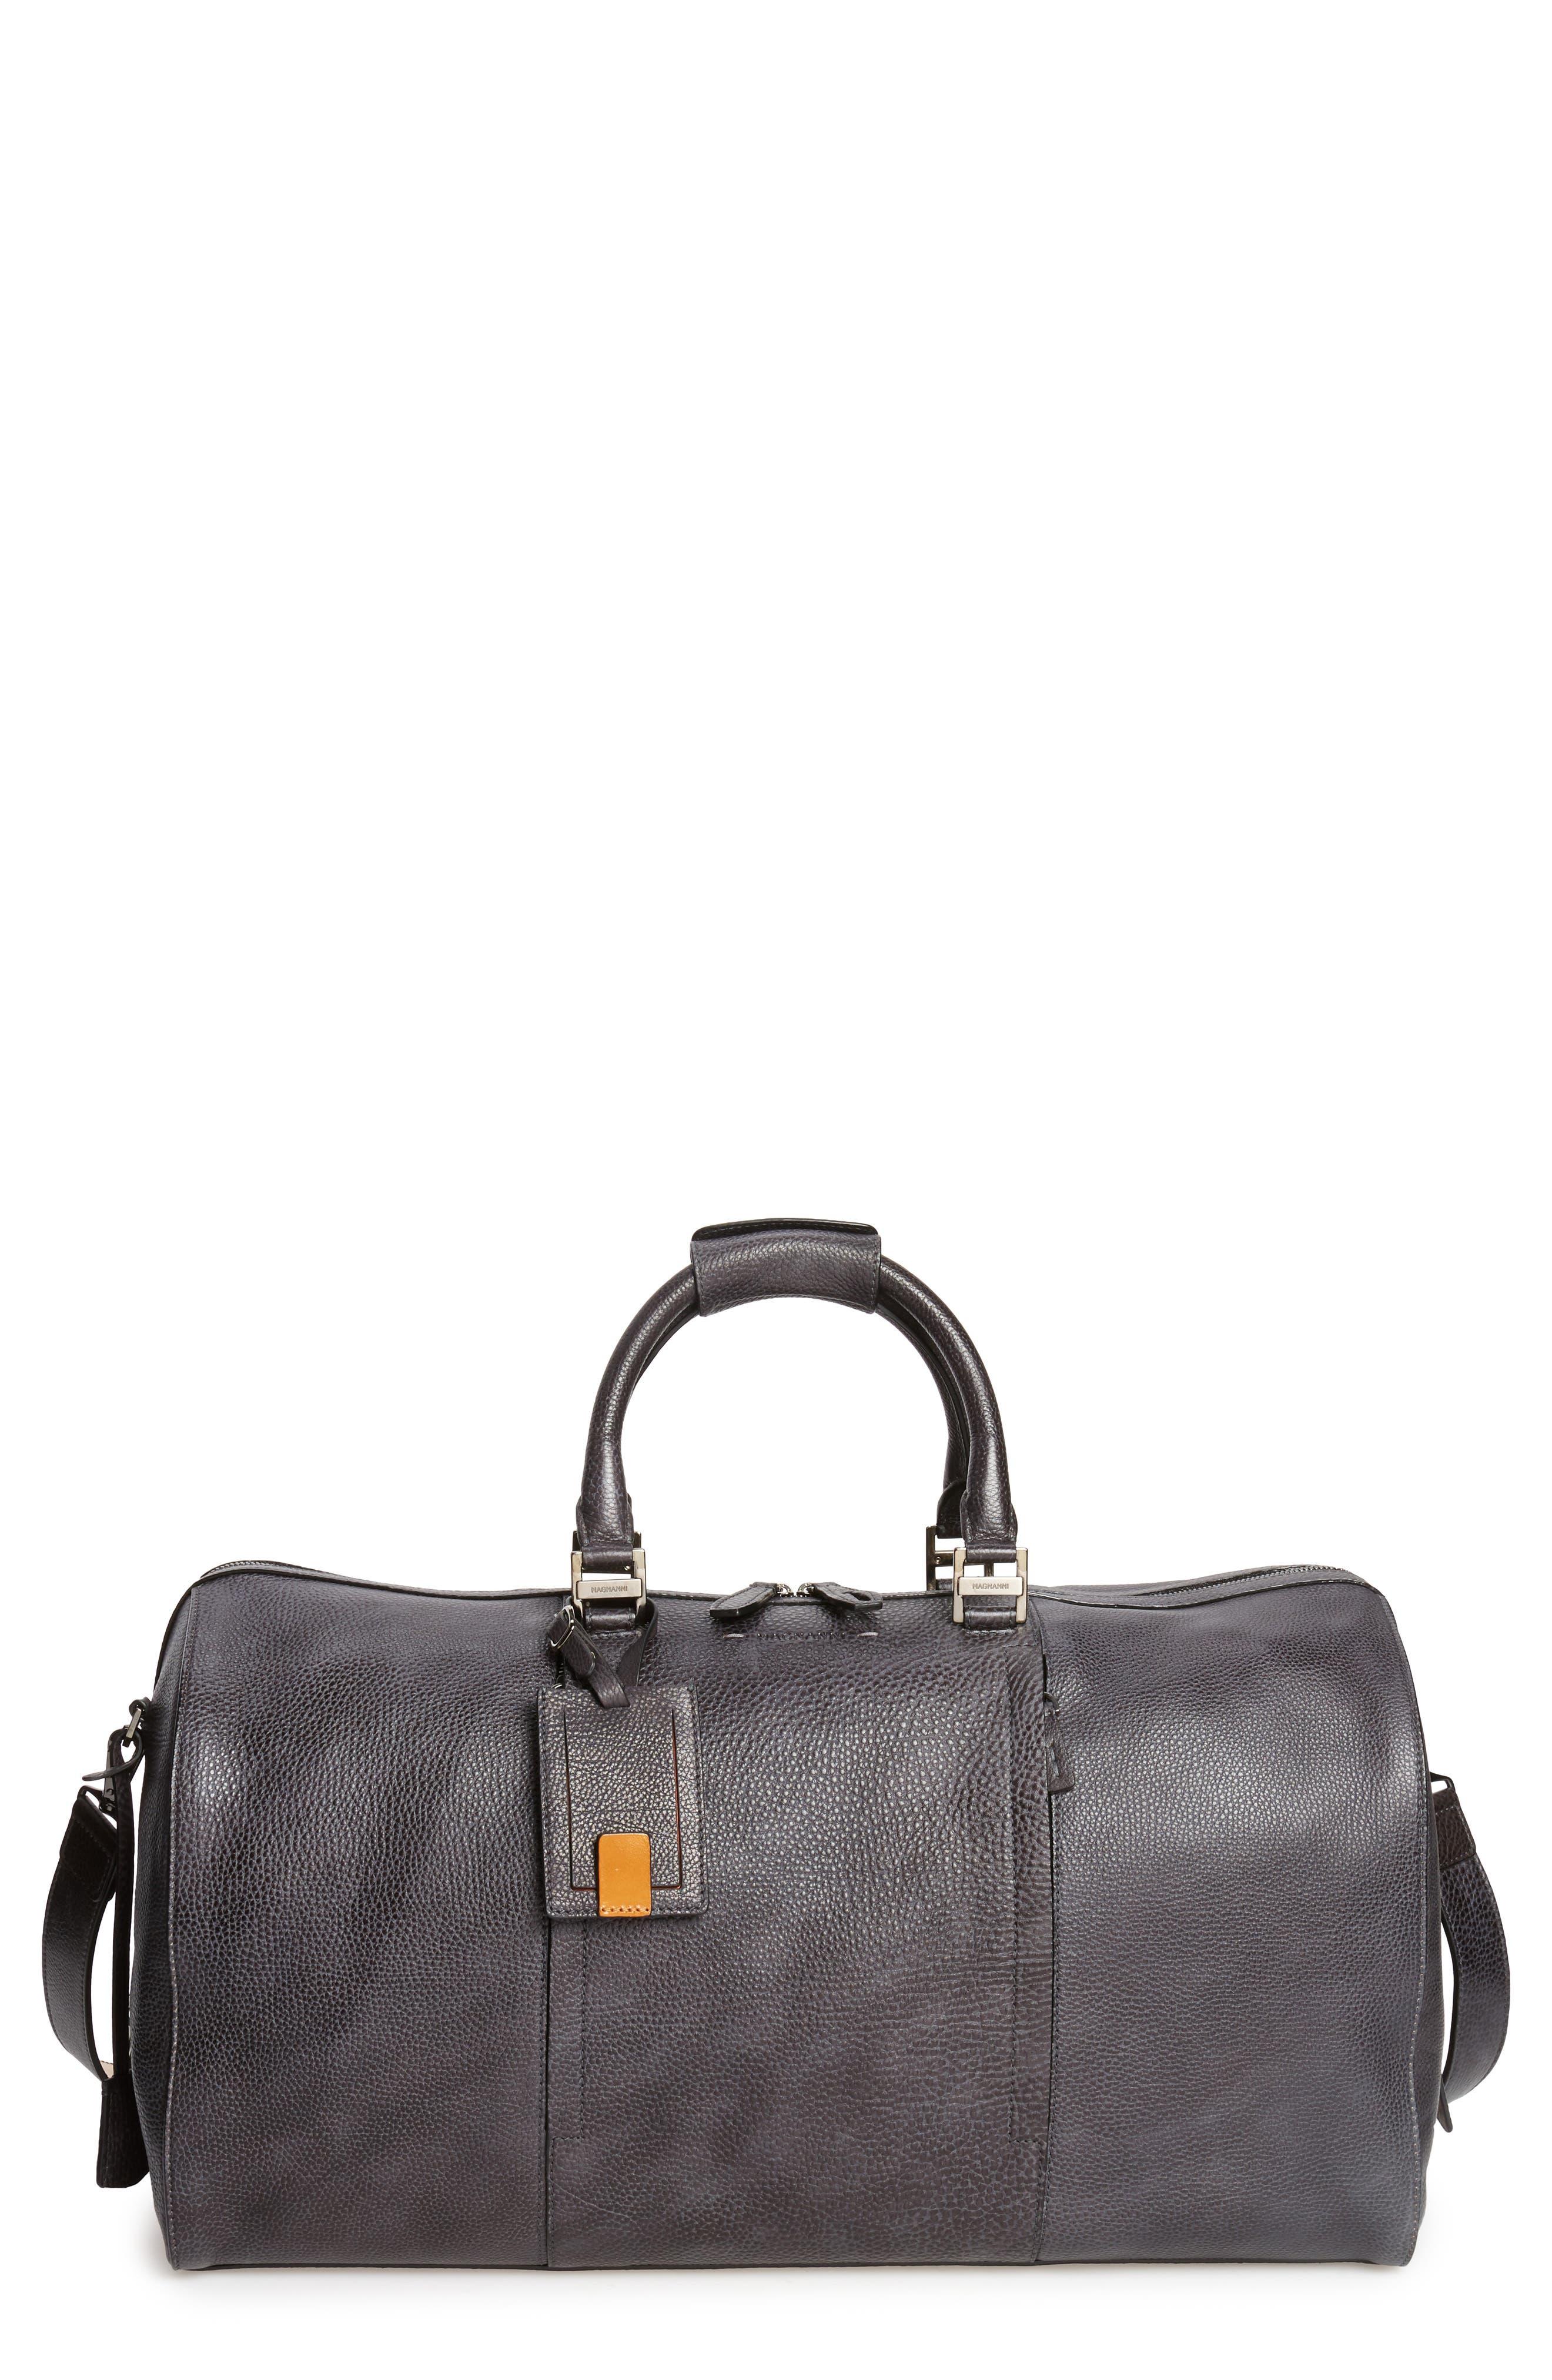 Traveler Leather Duffel Bag,                             Main thumbnail 1, color,                             020